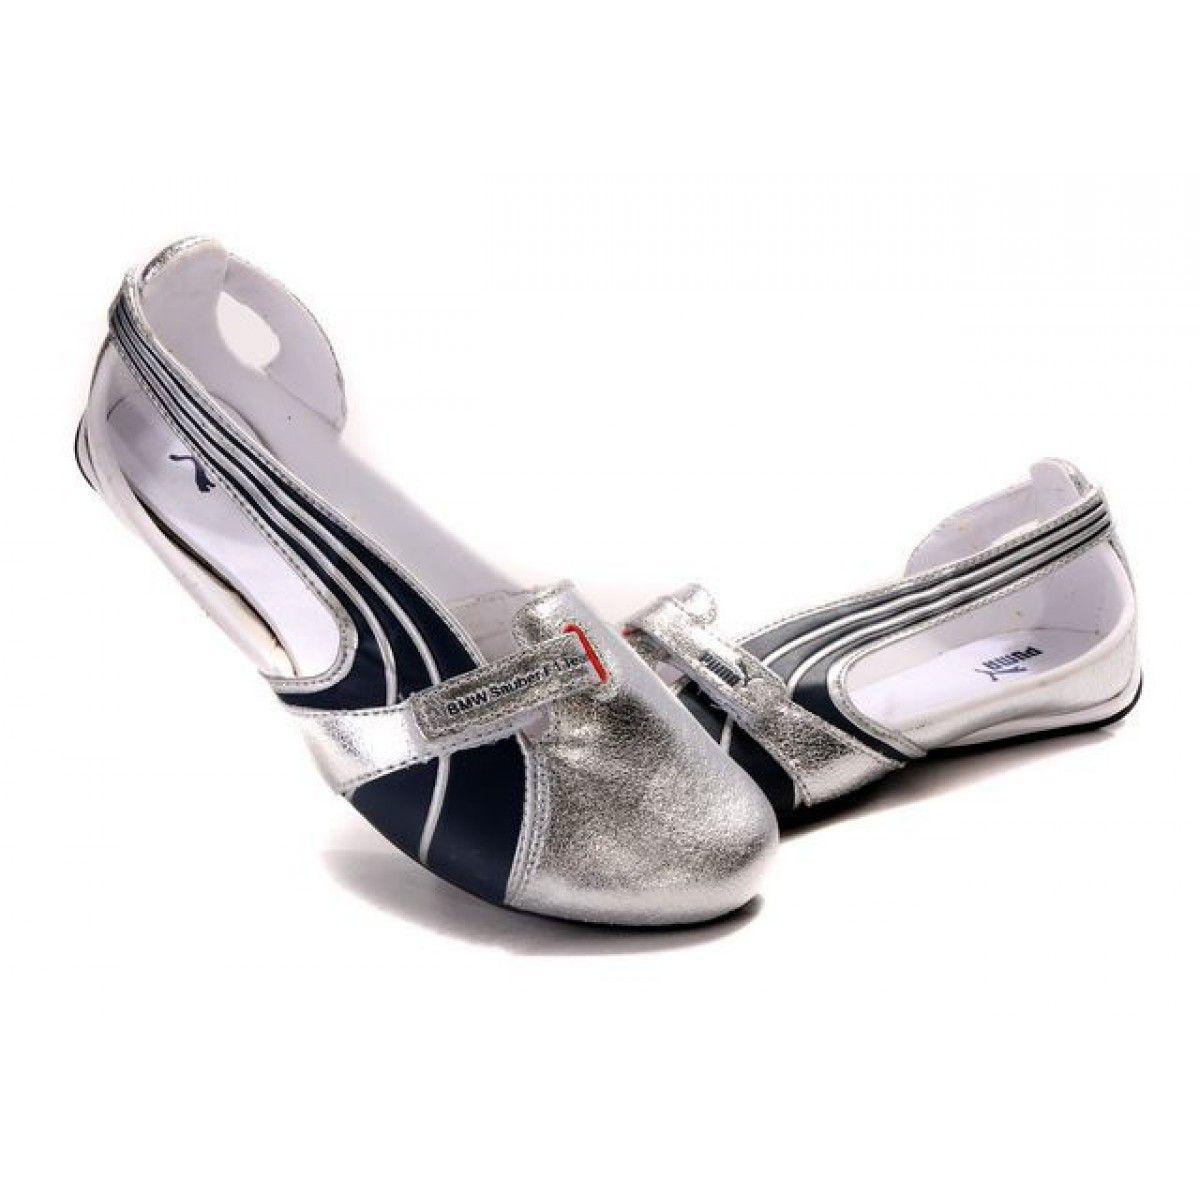 Puma black velcro sandals - Ballet Flats On Sale Puma Espera Ii Ballerina Flats Womens Sandals Silver Black